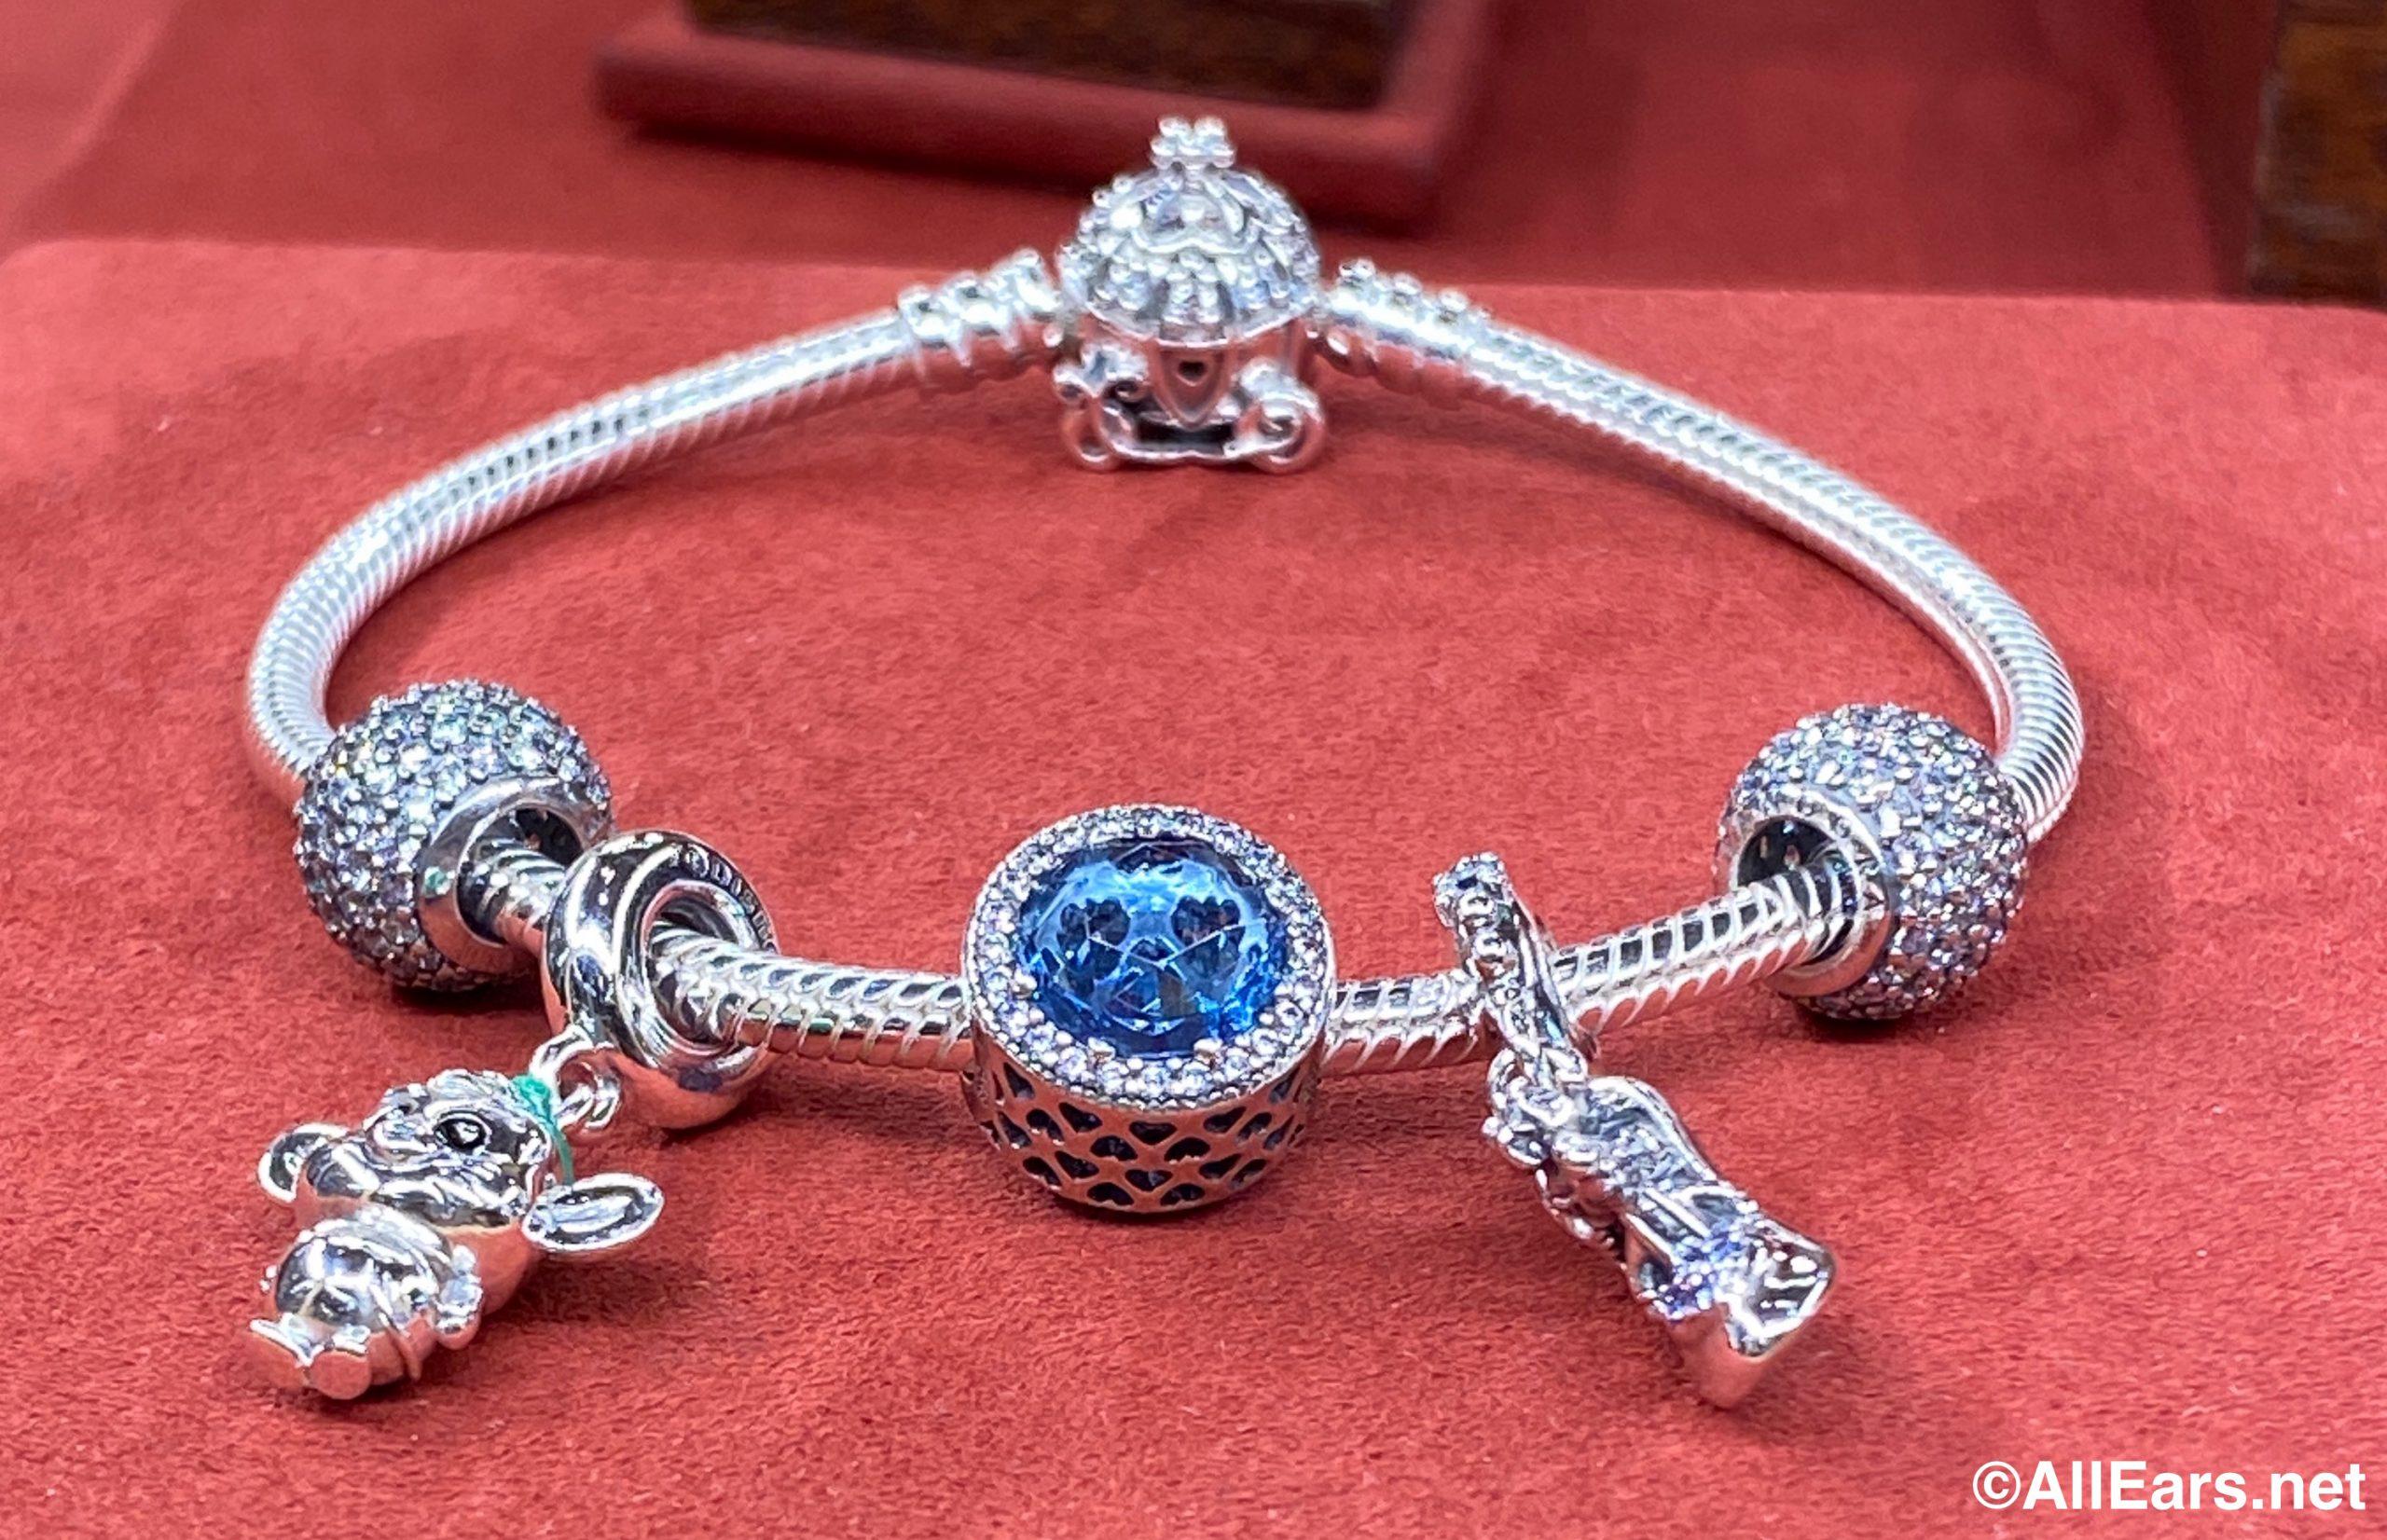 Wdw Magic Kingdom Uptown Jewelers Cinderella Pandora Charms Bracelet 1 Allears Net